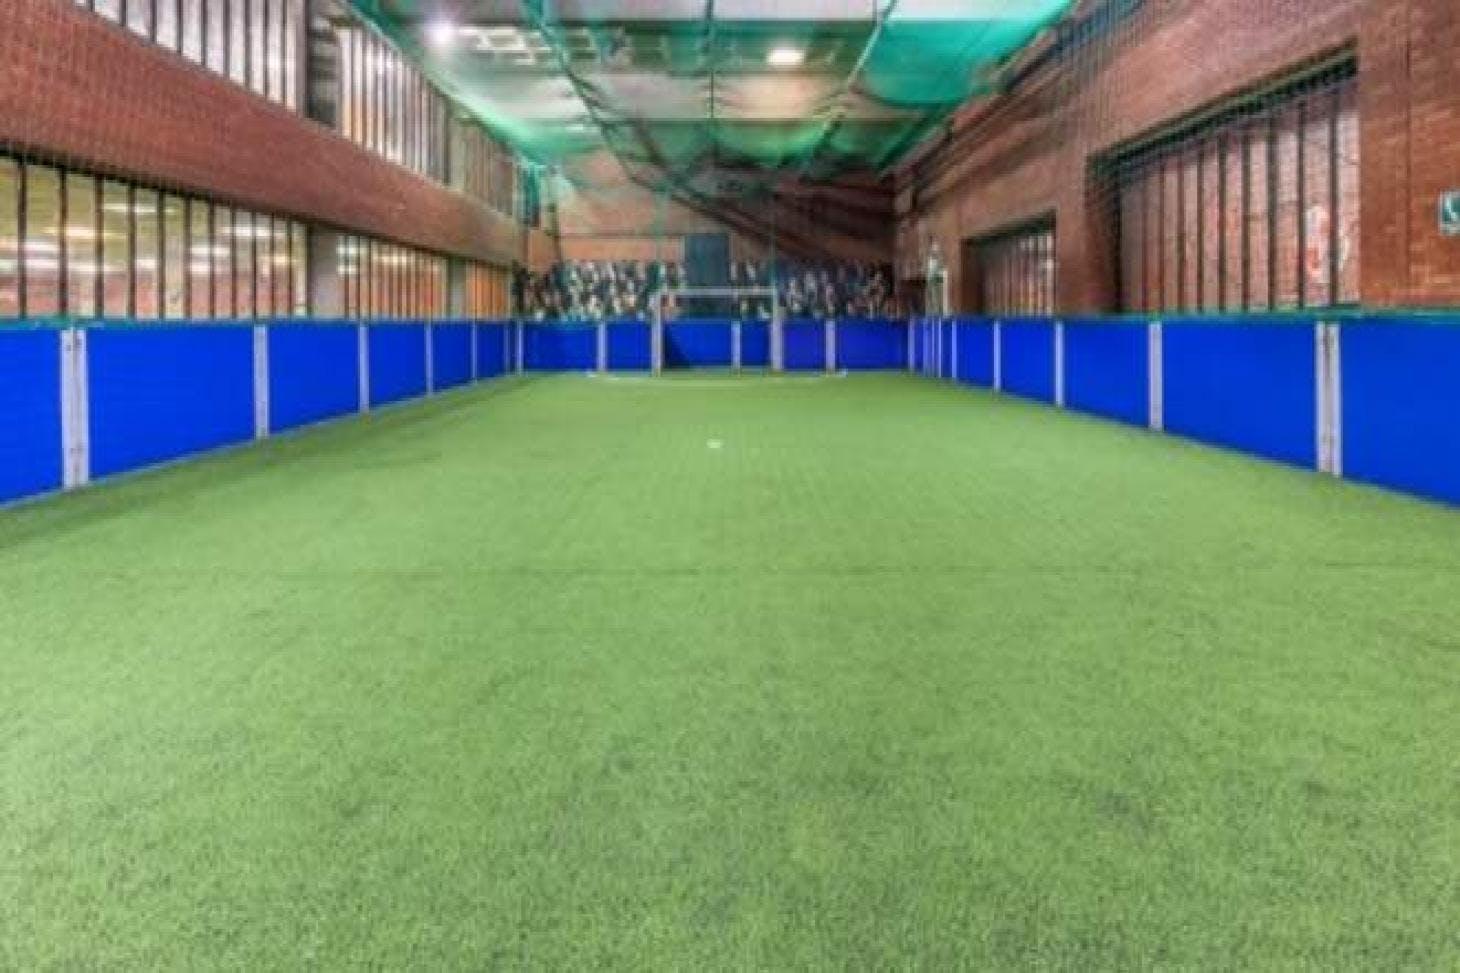 Brixton Recreation Centre Outdoor | Astroturf futsal pitch